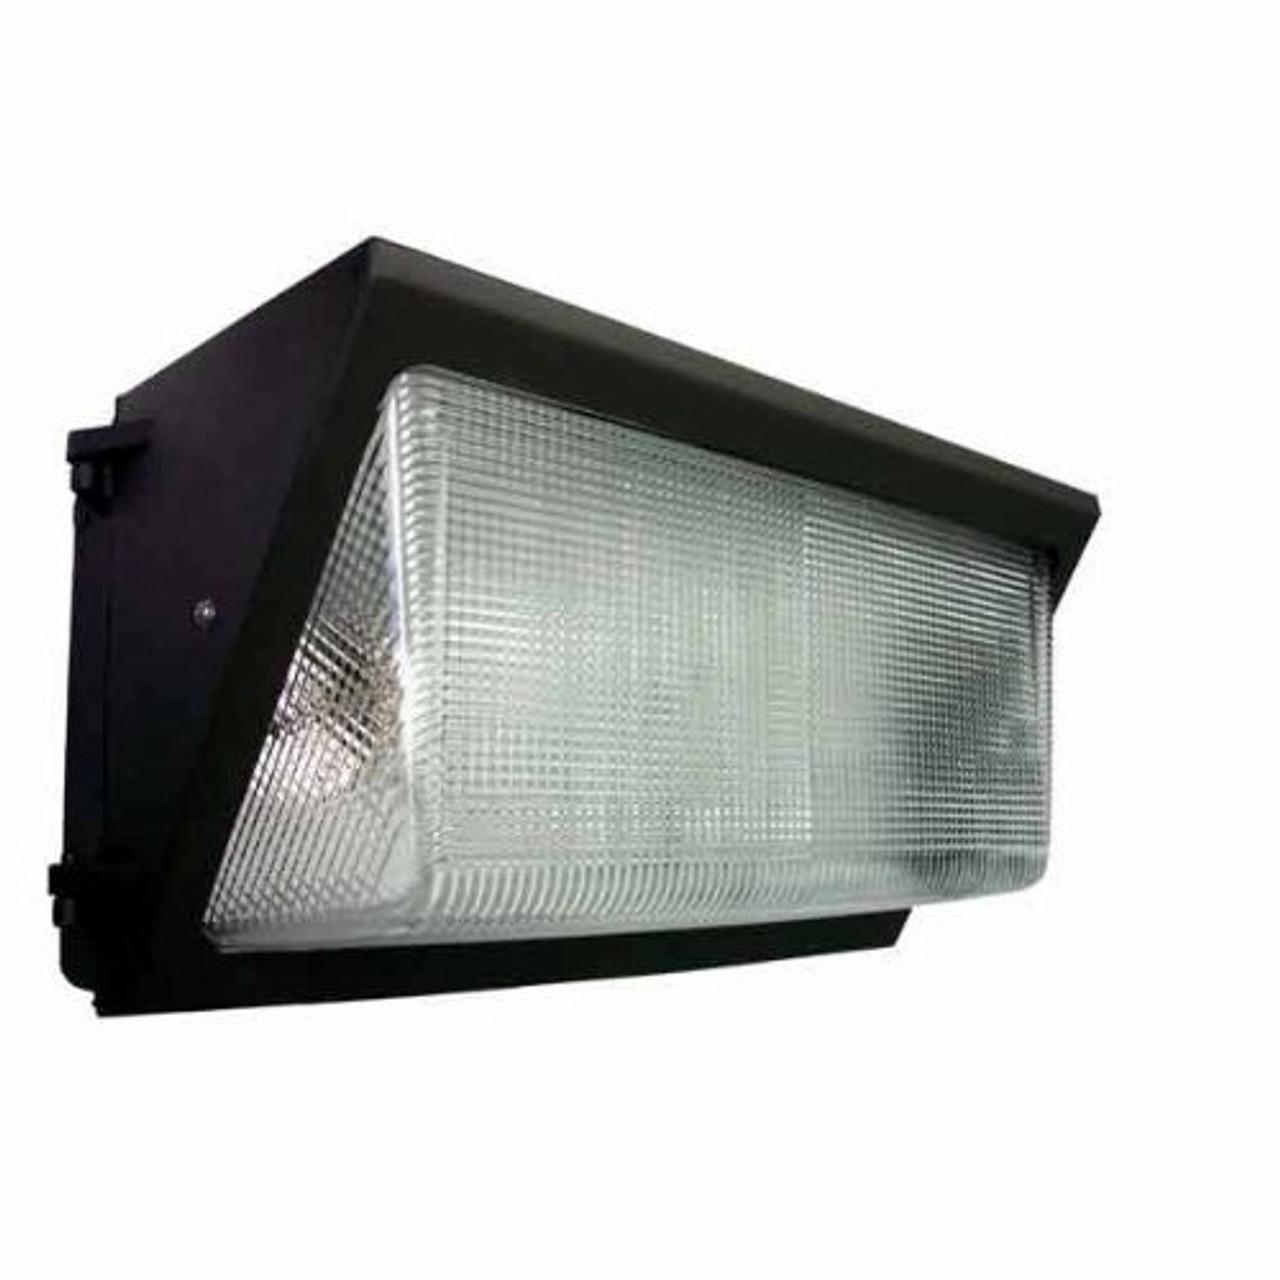 LED Wall Pack 57 Watt 6639 Lumens